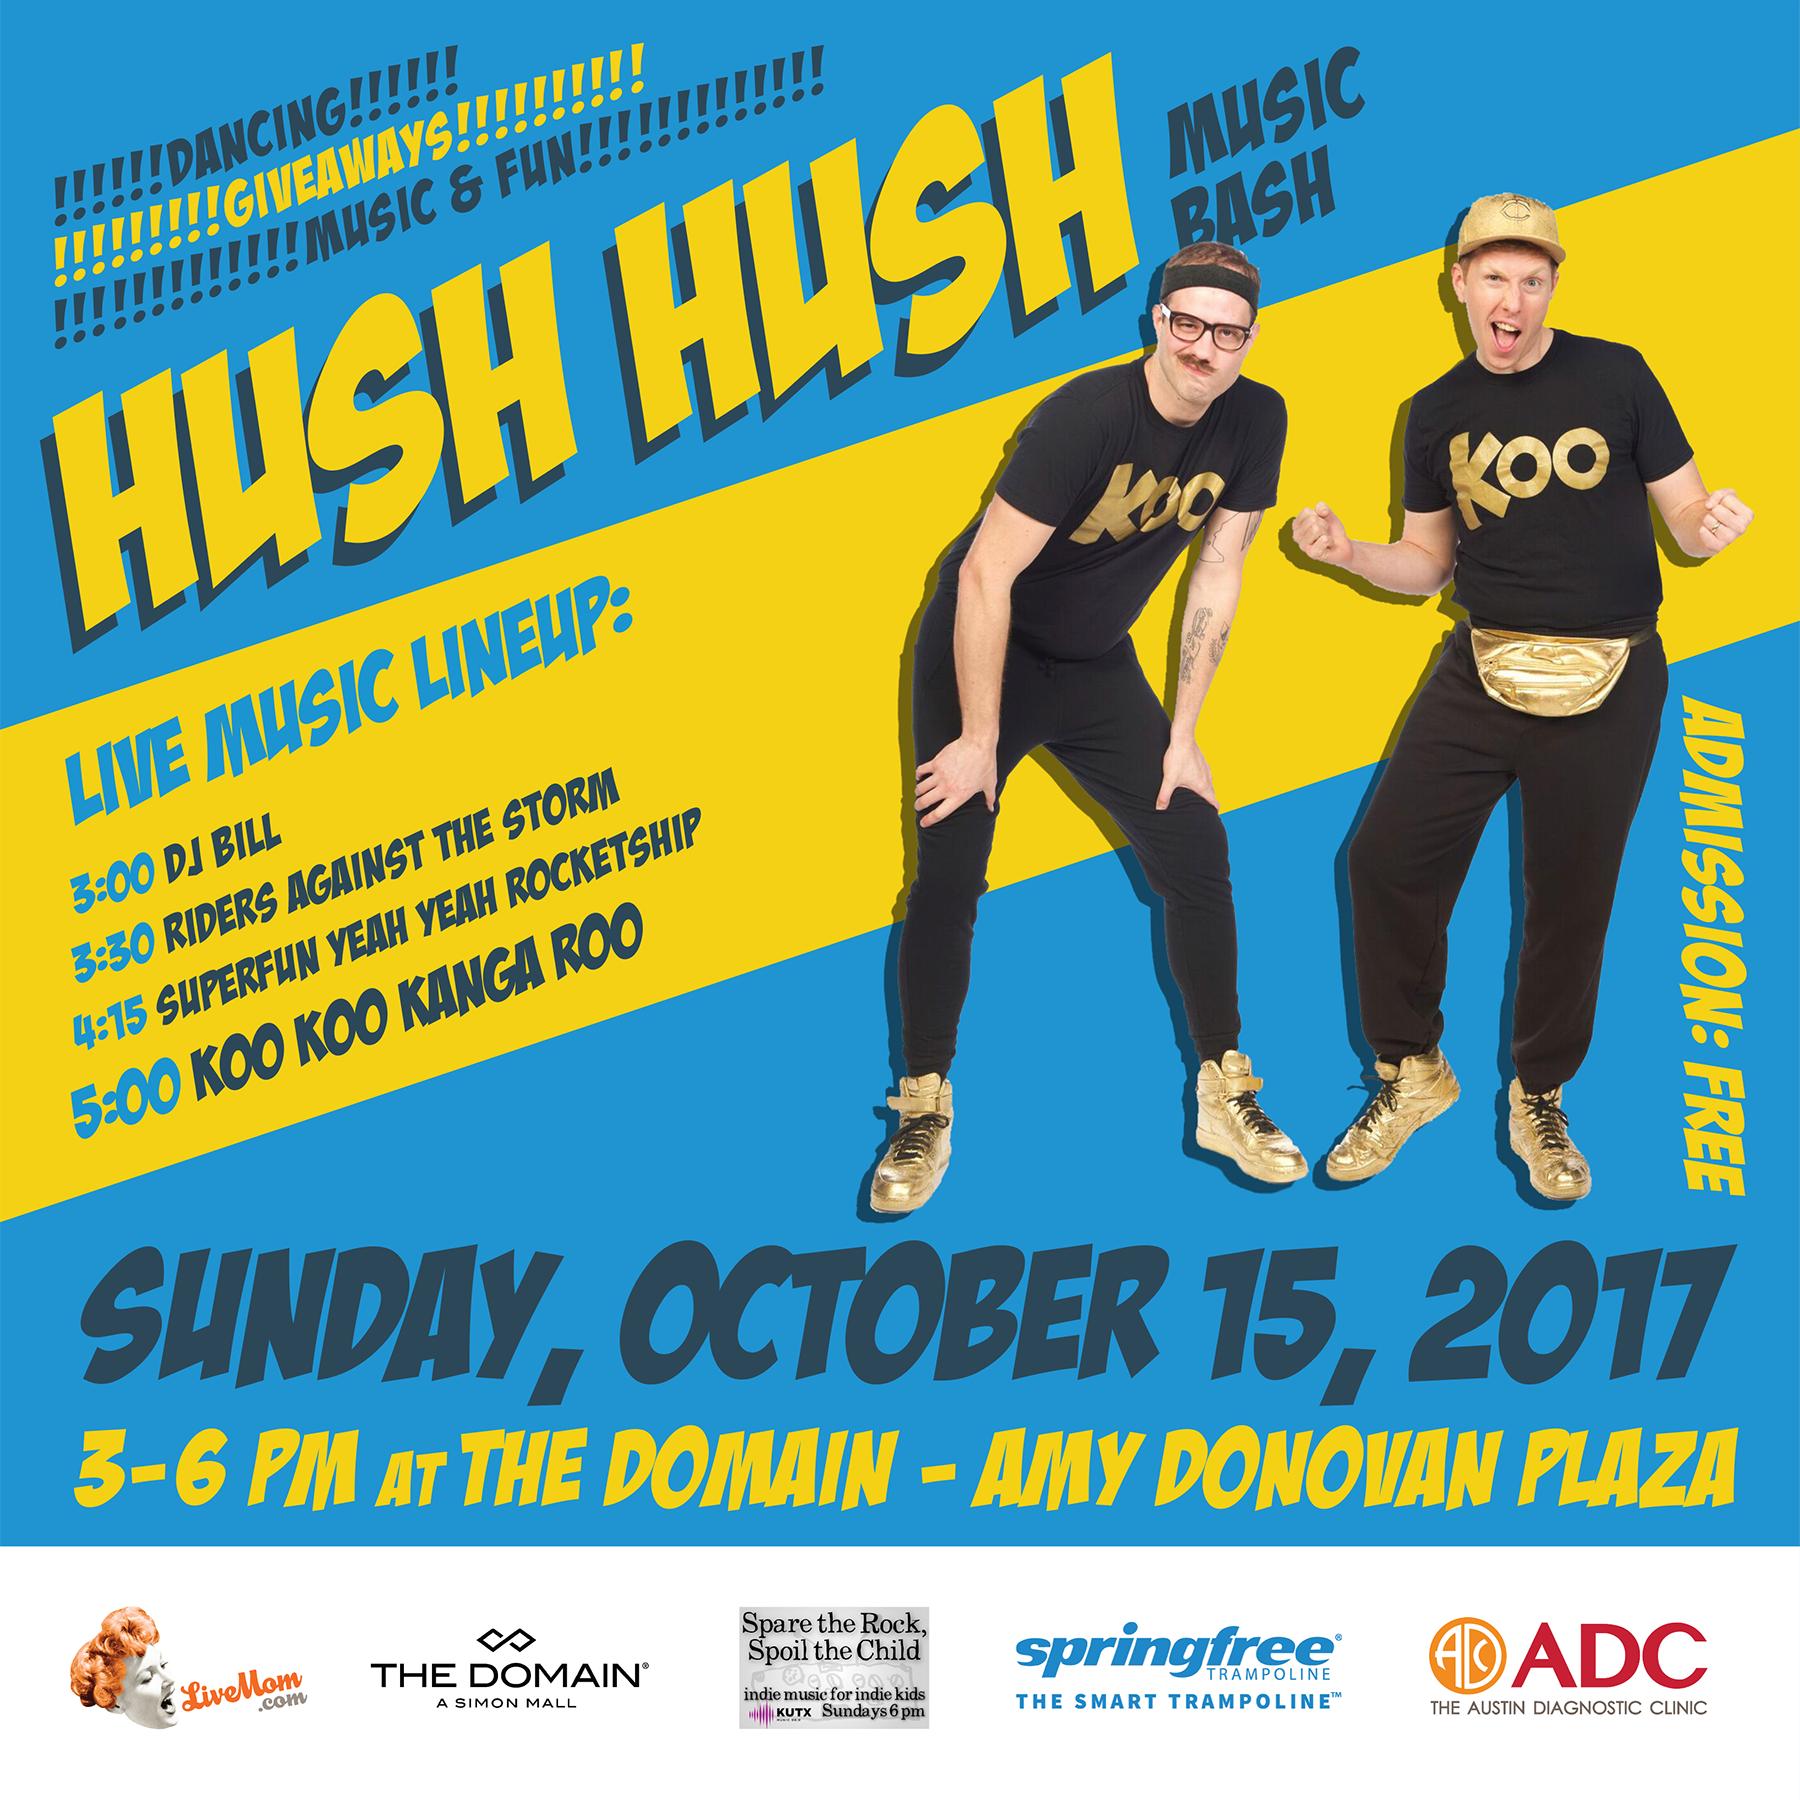 Hush Hush Music Bash at The Domain